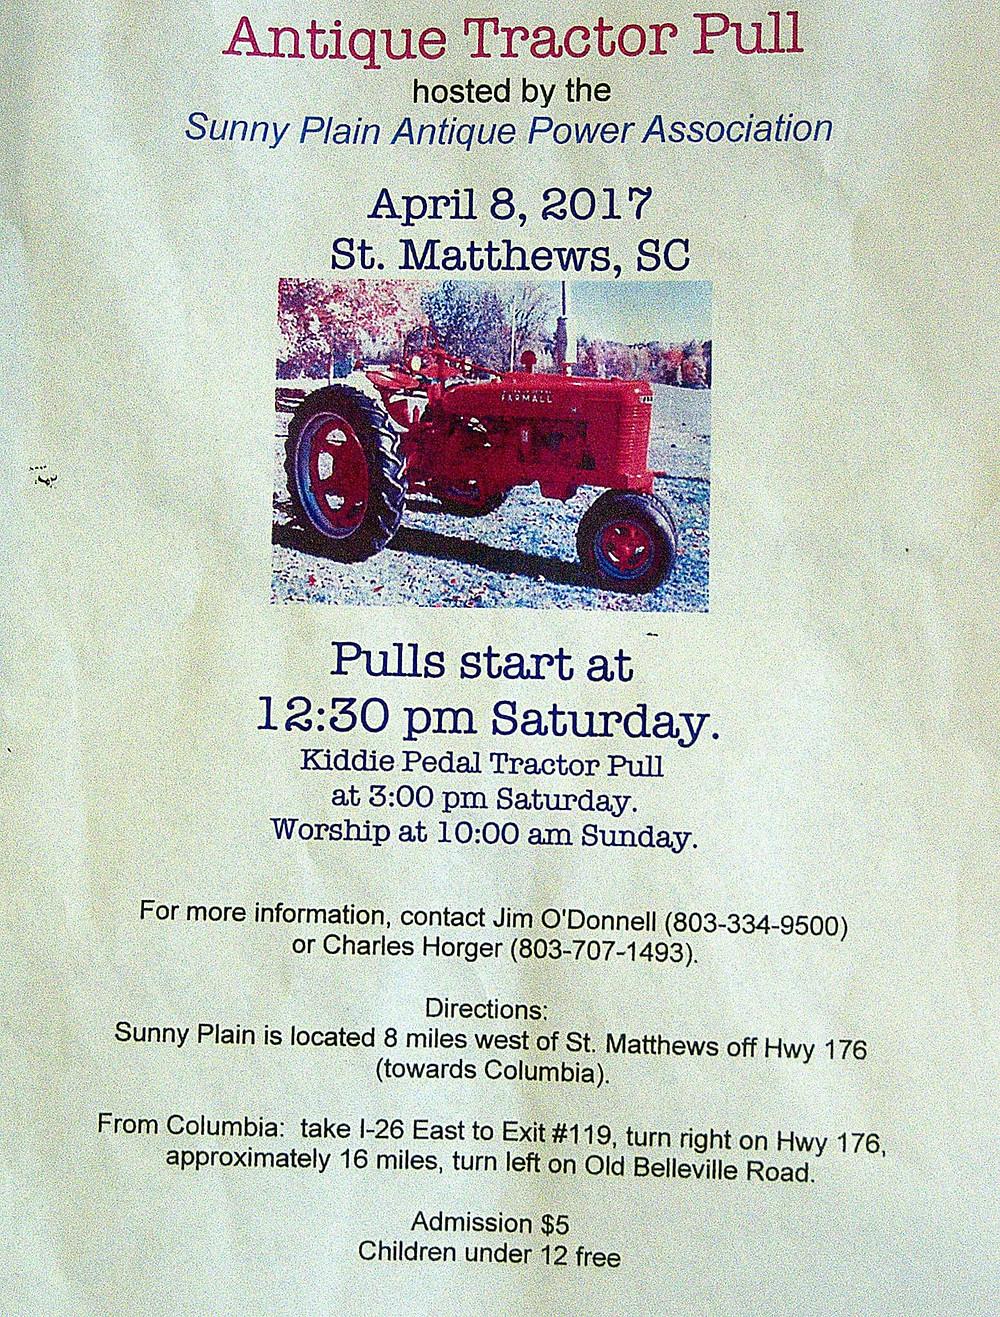 Antique Tractor Pull, Sunny Plain Antique Power Association